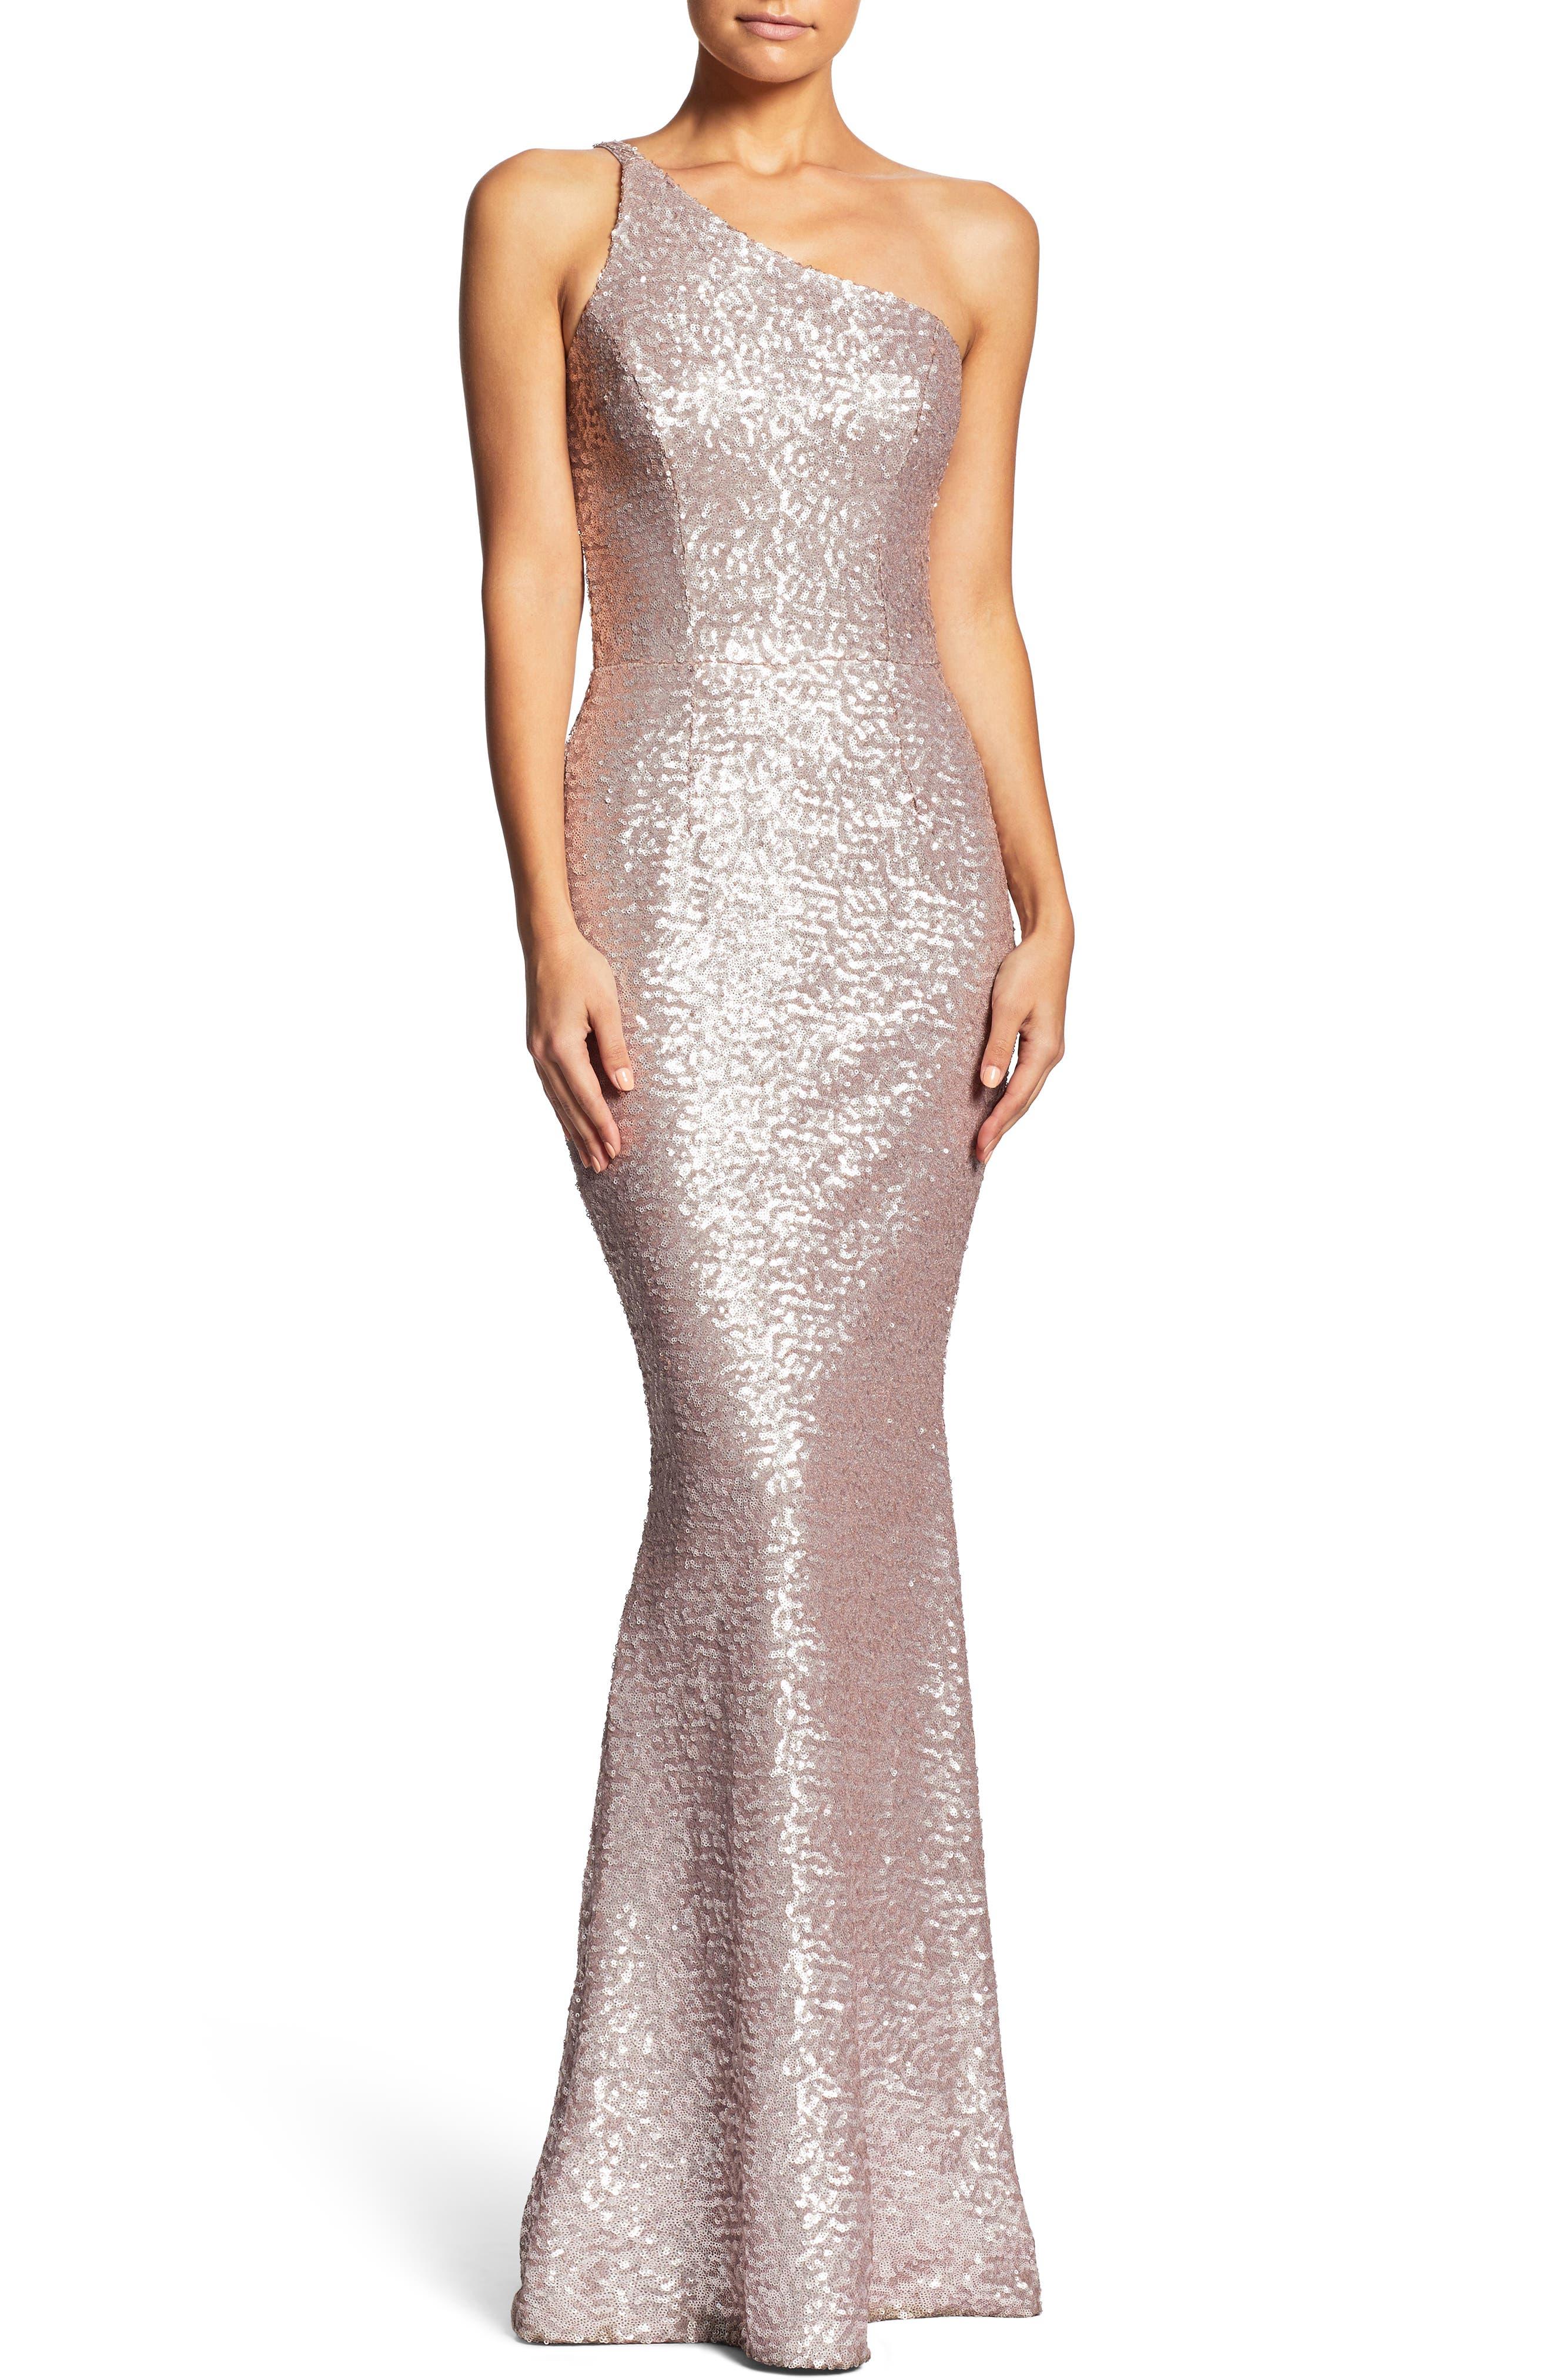 Blush Colored Prom Dresses